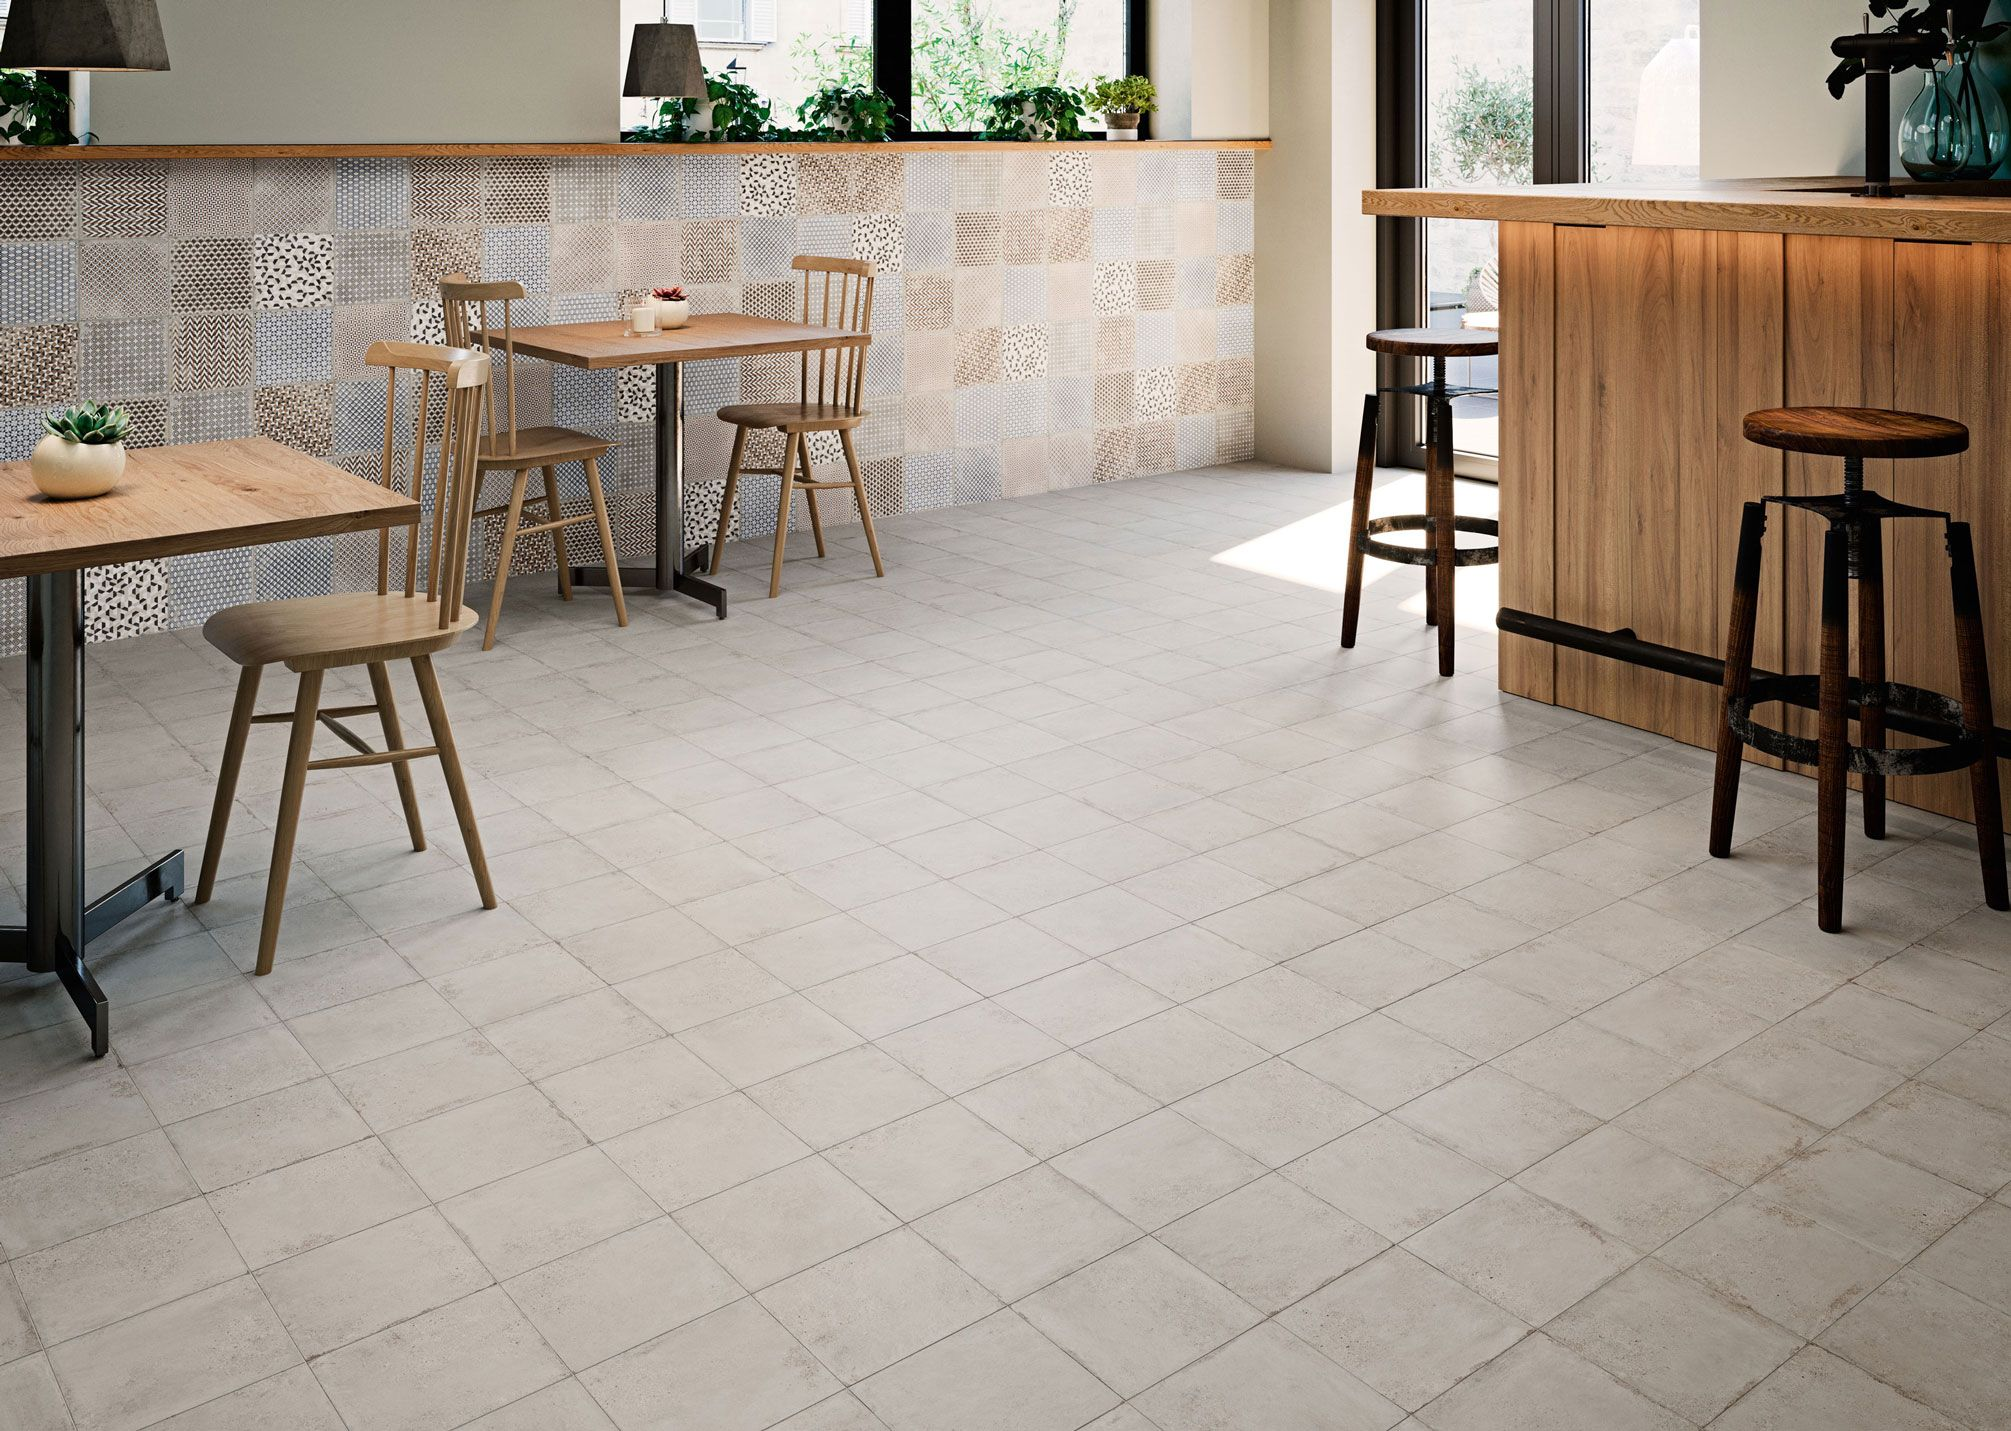 Wall Tiles For Restaurants In 2020 Ceramic Floor Interior Design Tips Ceramica